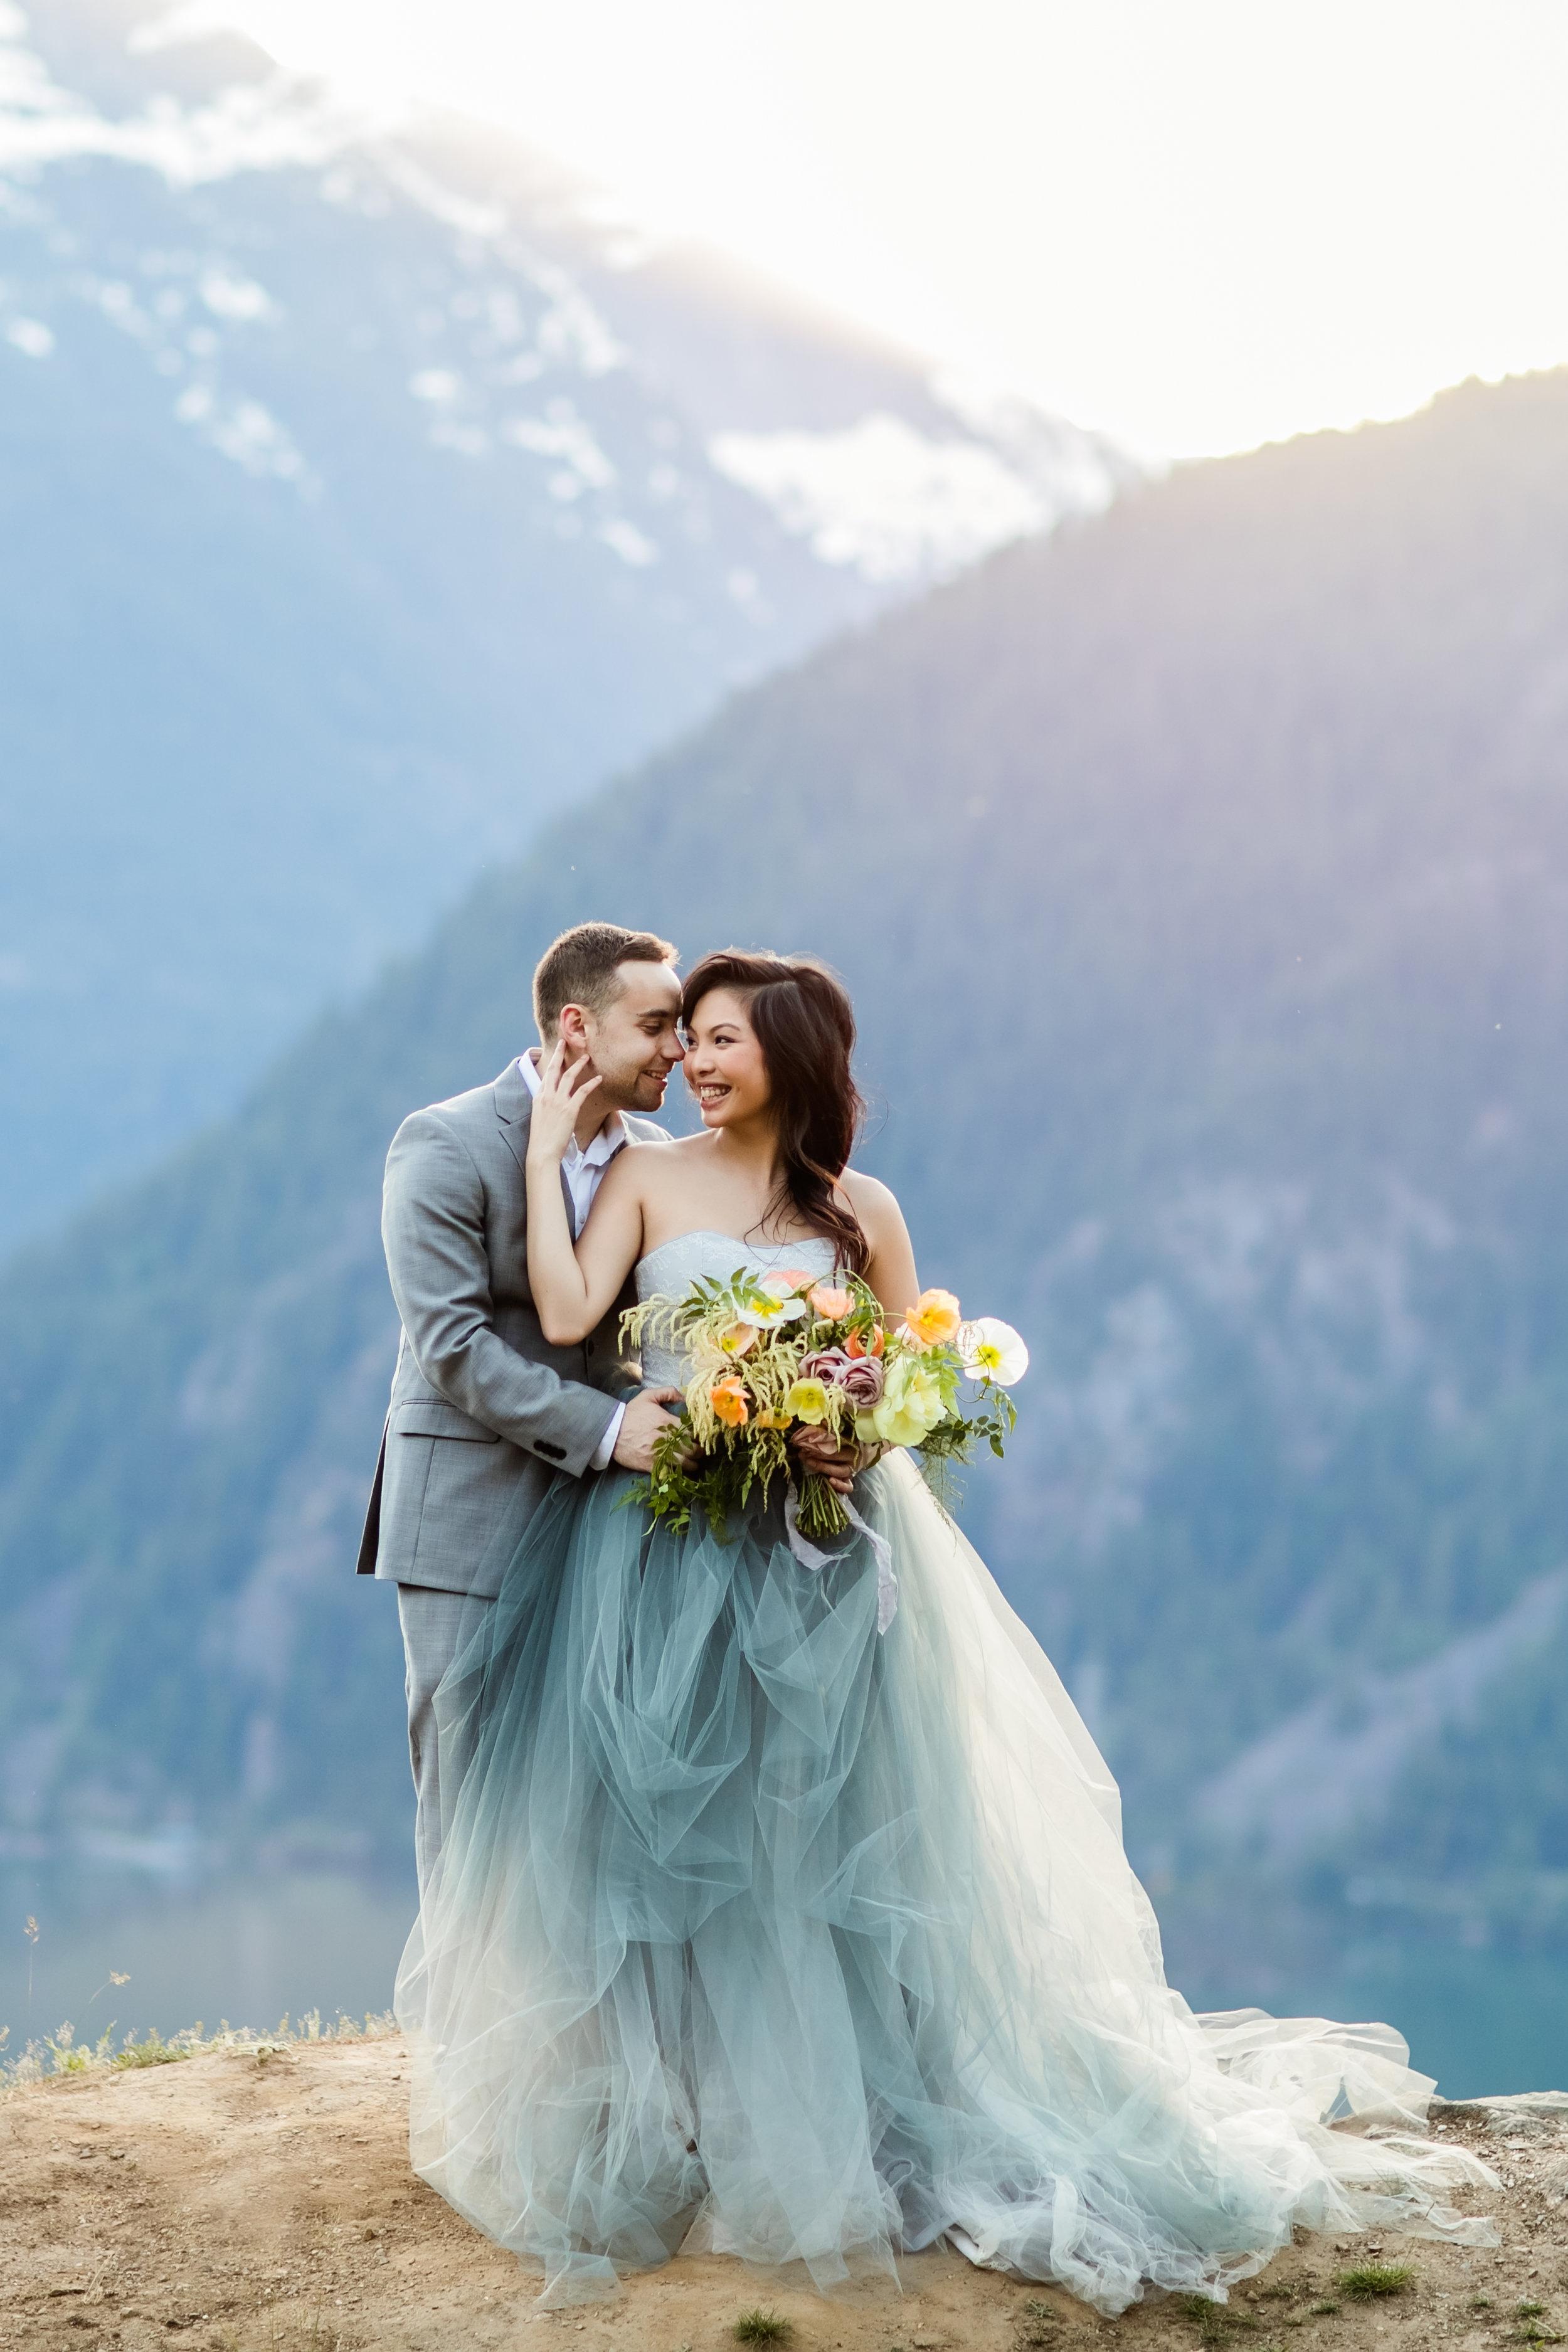 wedding-florist-Bellingham-Seattle-engagement-02.jpg